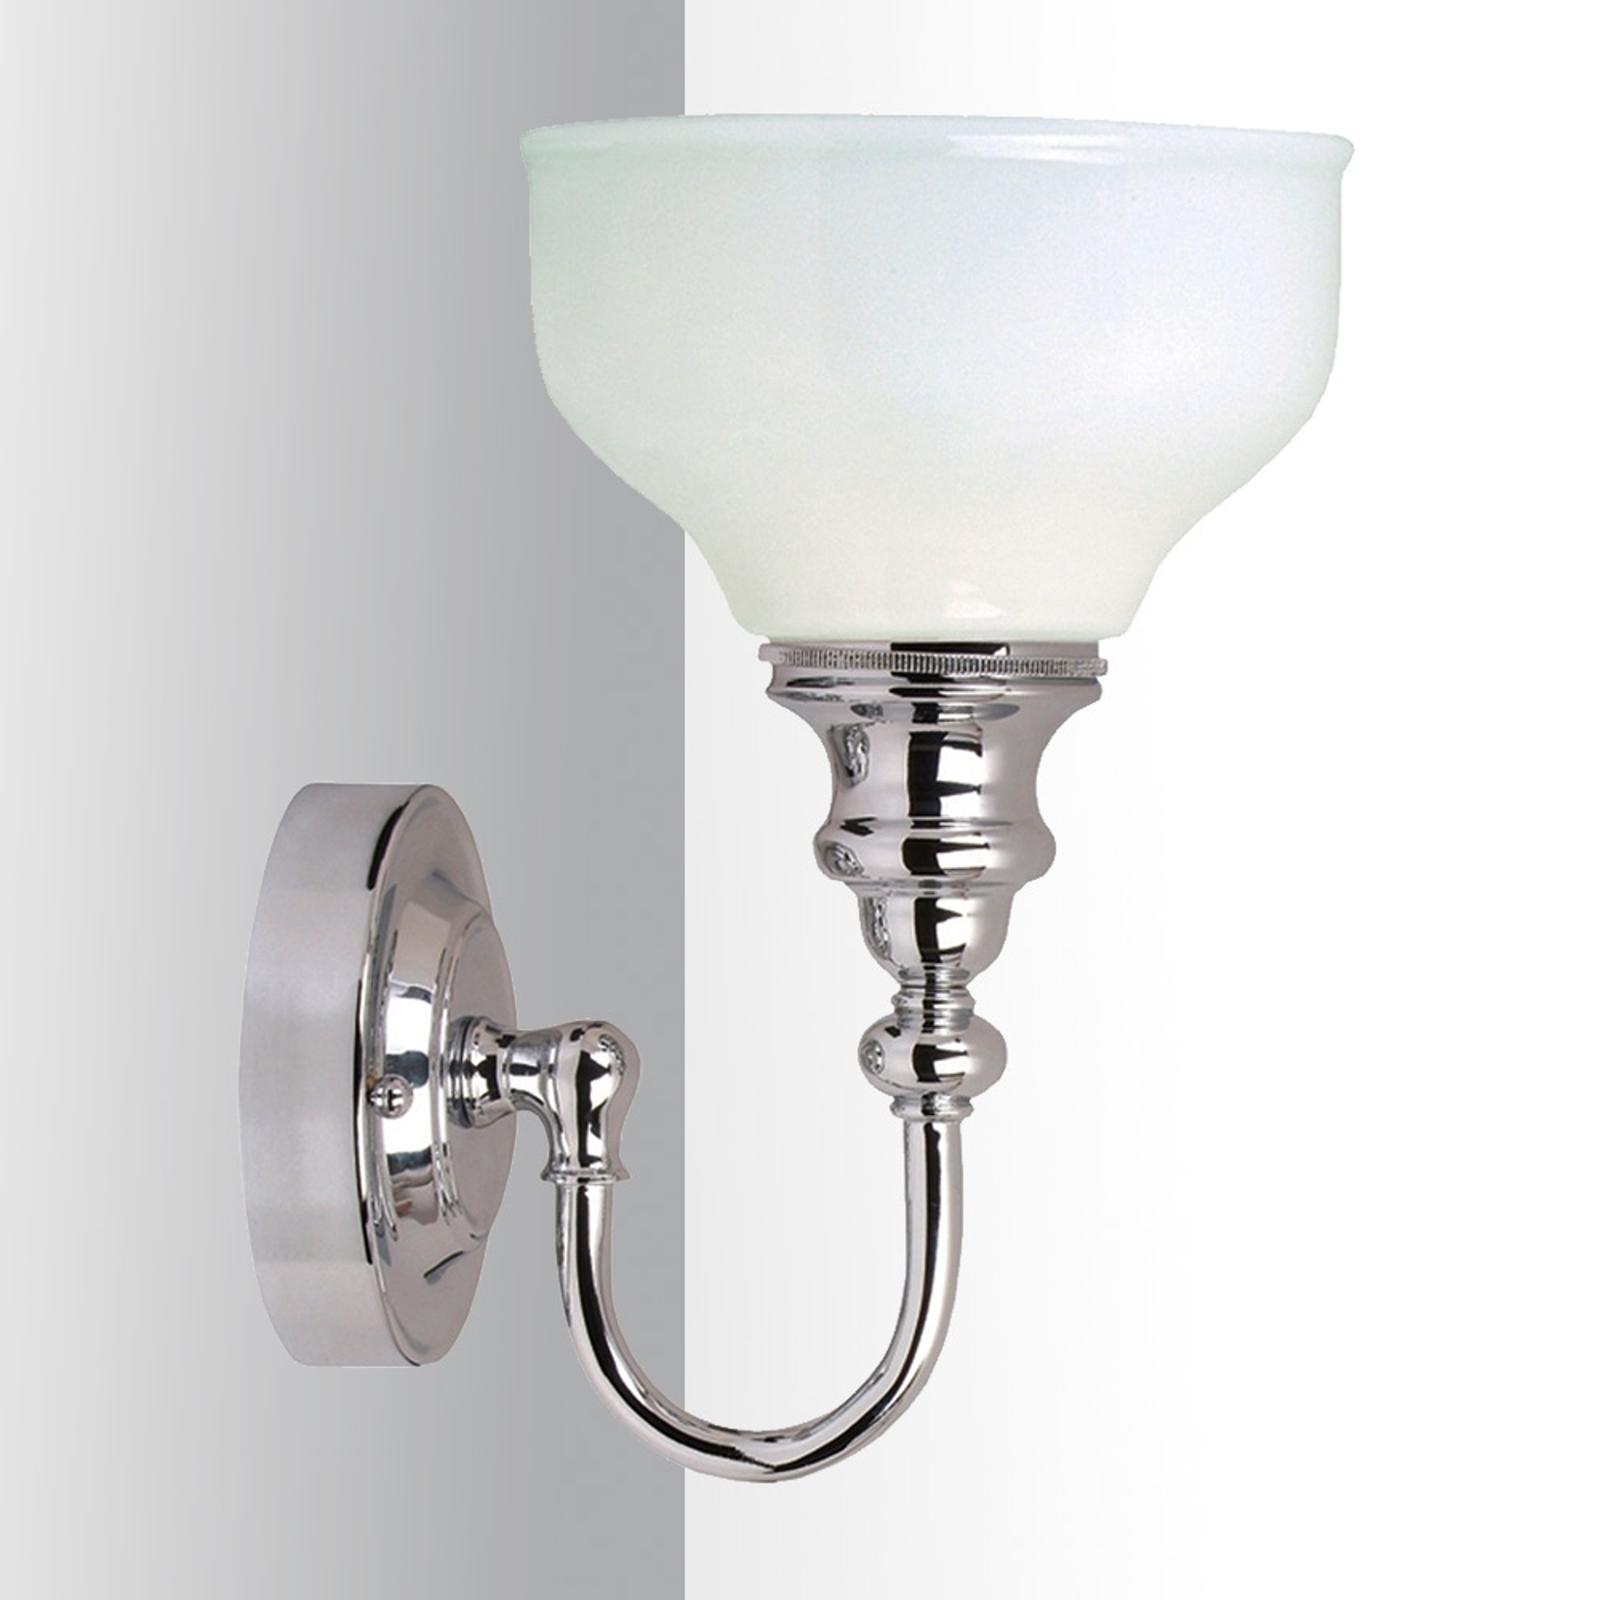 Eksklusiv Cheadle speillampe med et lys